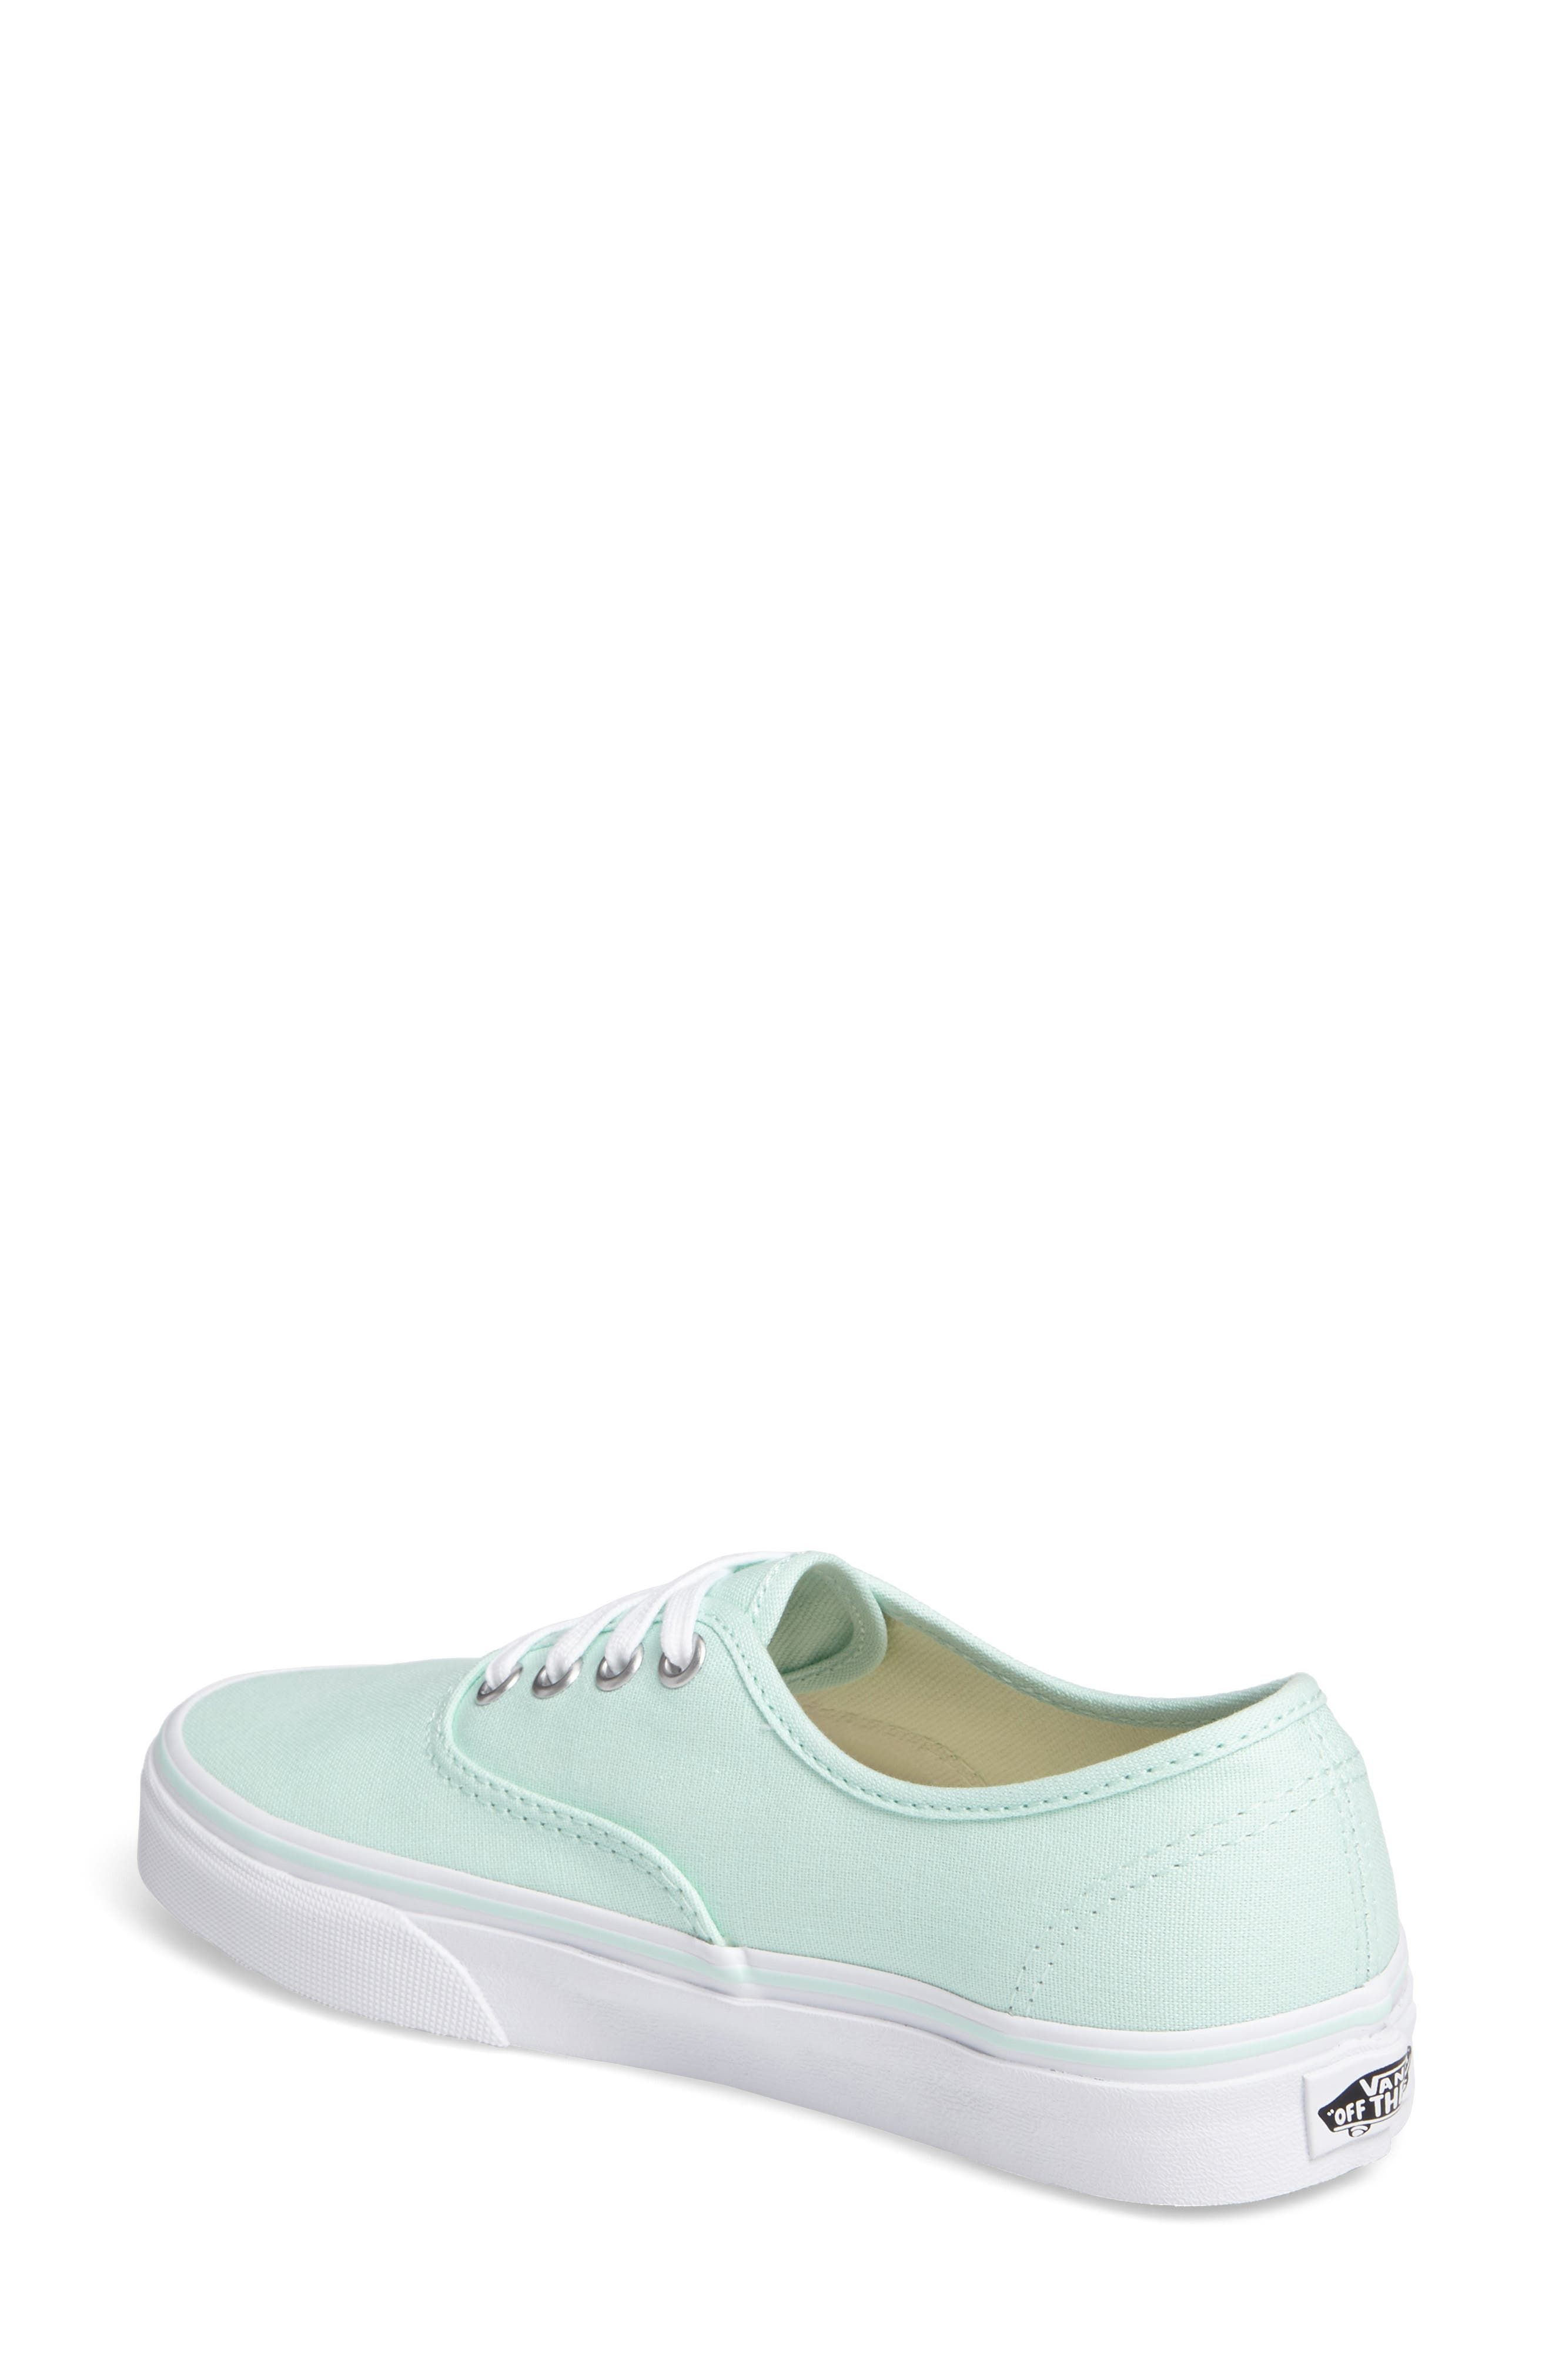 ,                             'Authentic' Sneaker,                             Alternate thumbnail 628, color,                             410